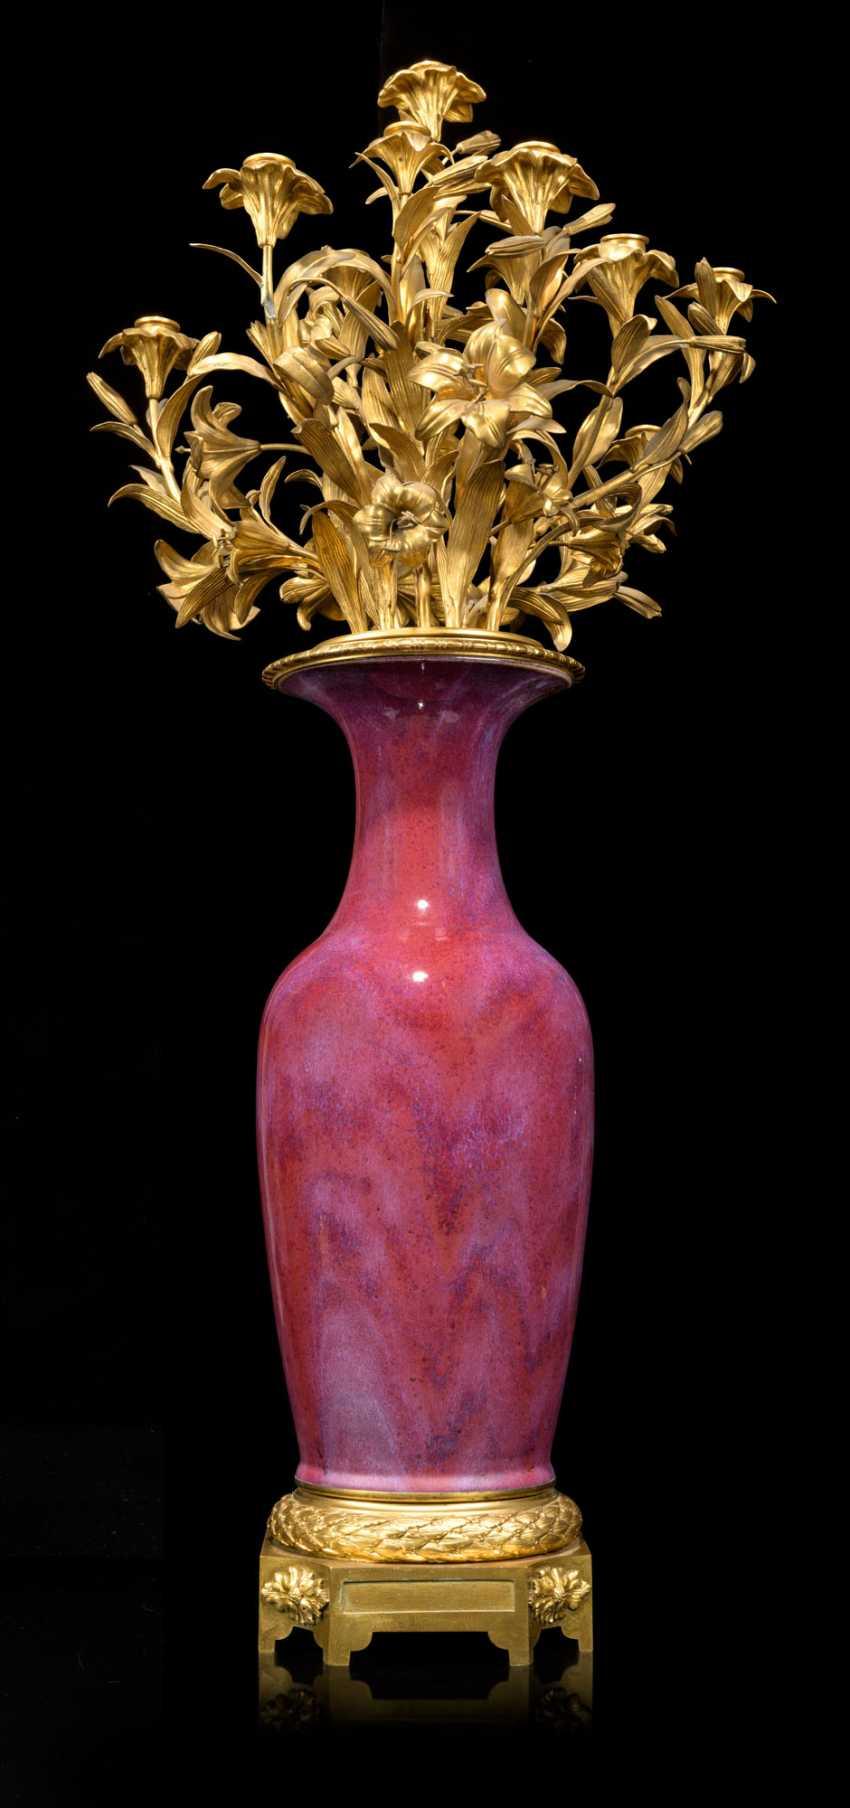 A PAIR OF FRENCH ORMOLU-MOUNTED CHINESE FLAMBE-GLAZED PORCELAIN TWELVE-LIGHT VASE-CANDELABRA - photo 3